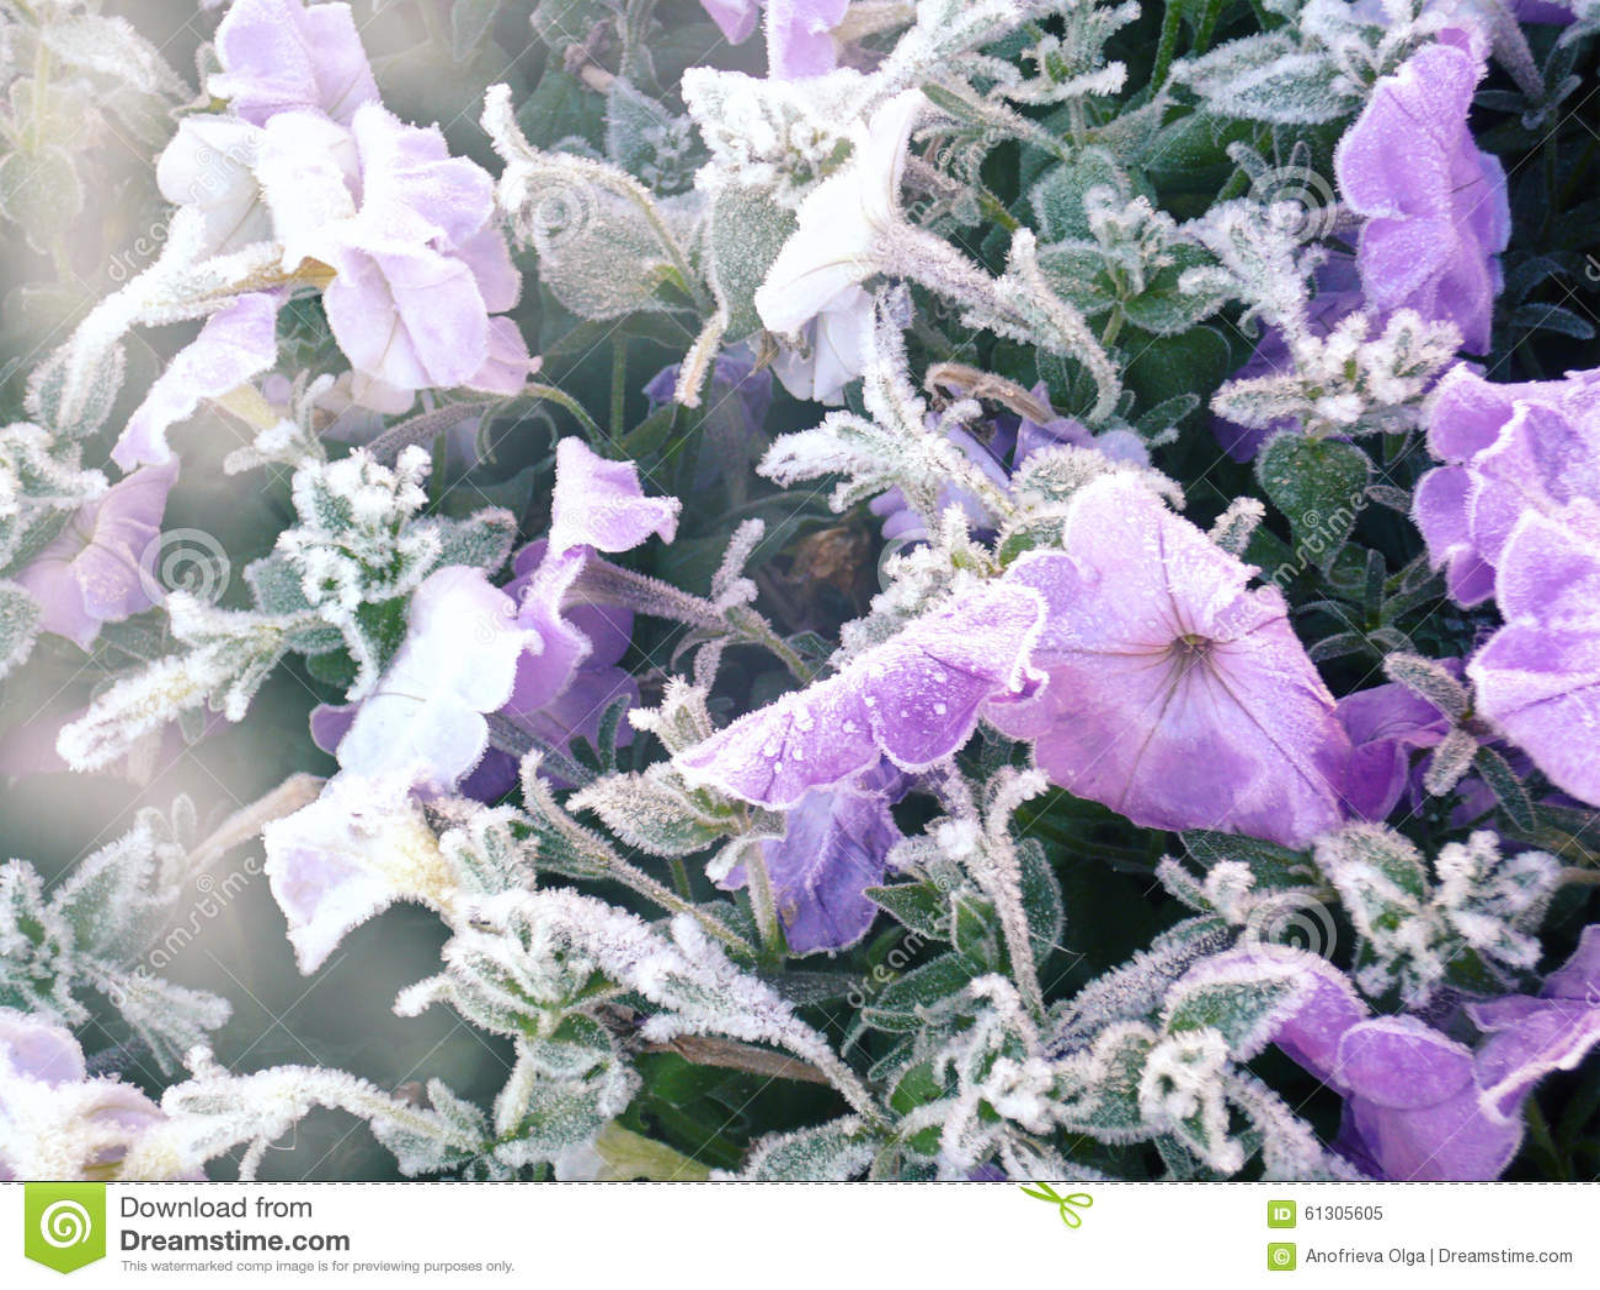 Gentle frozen flowers